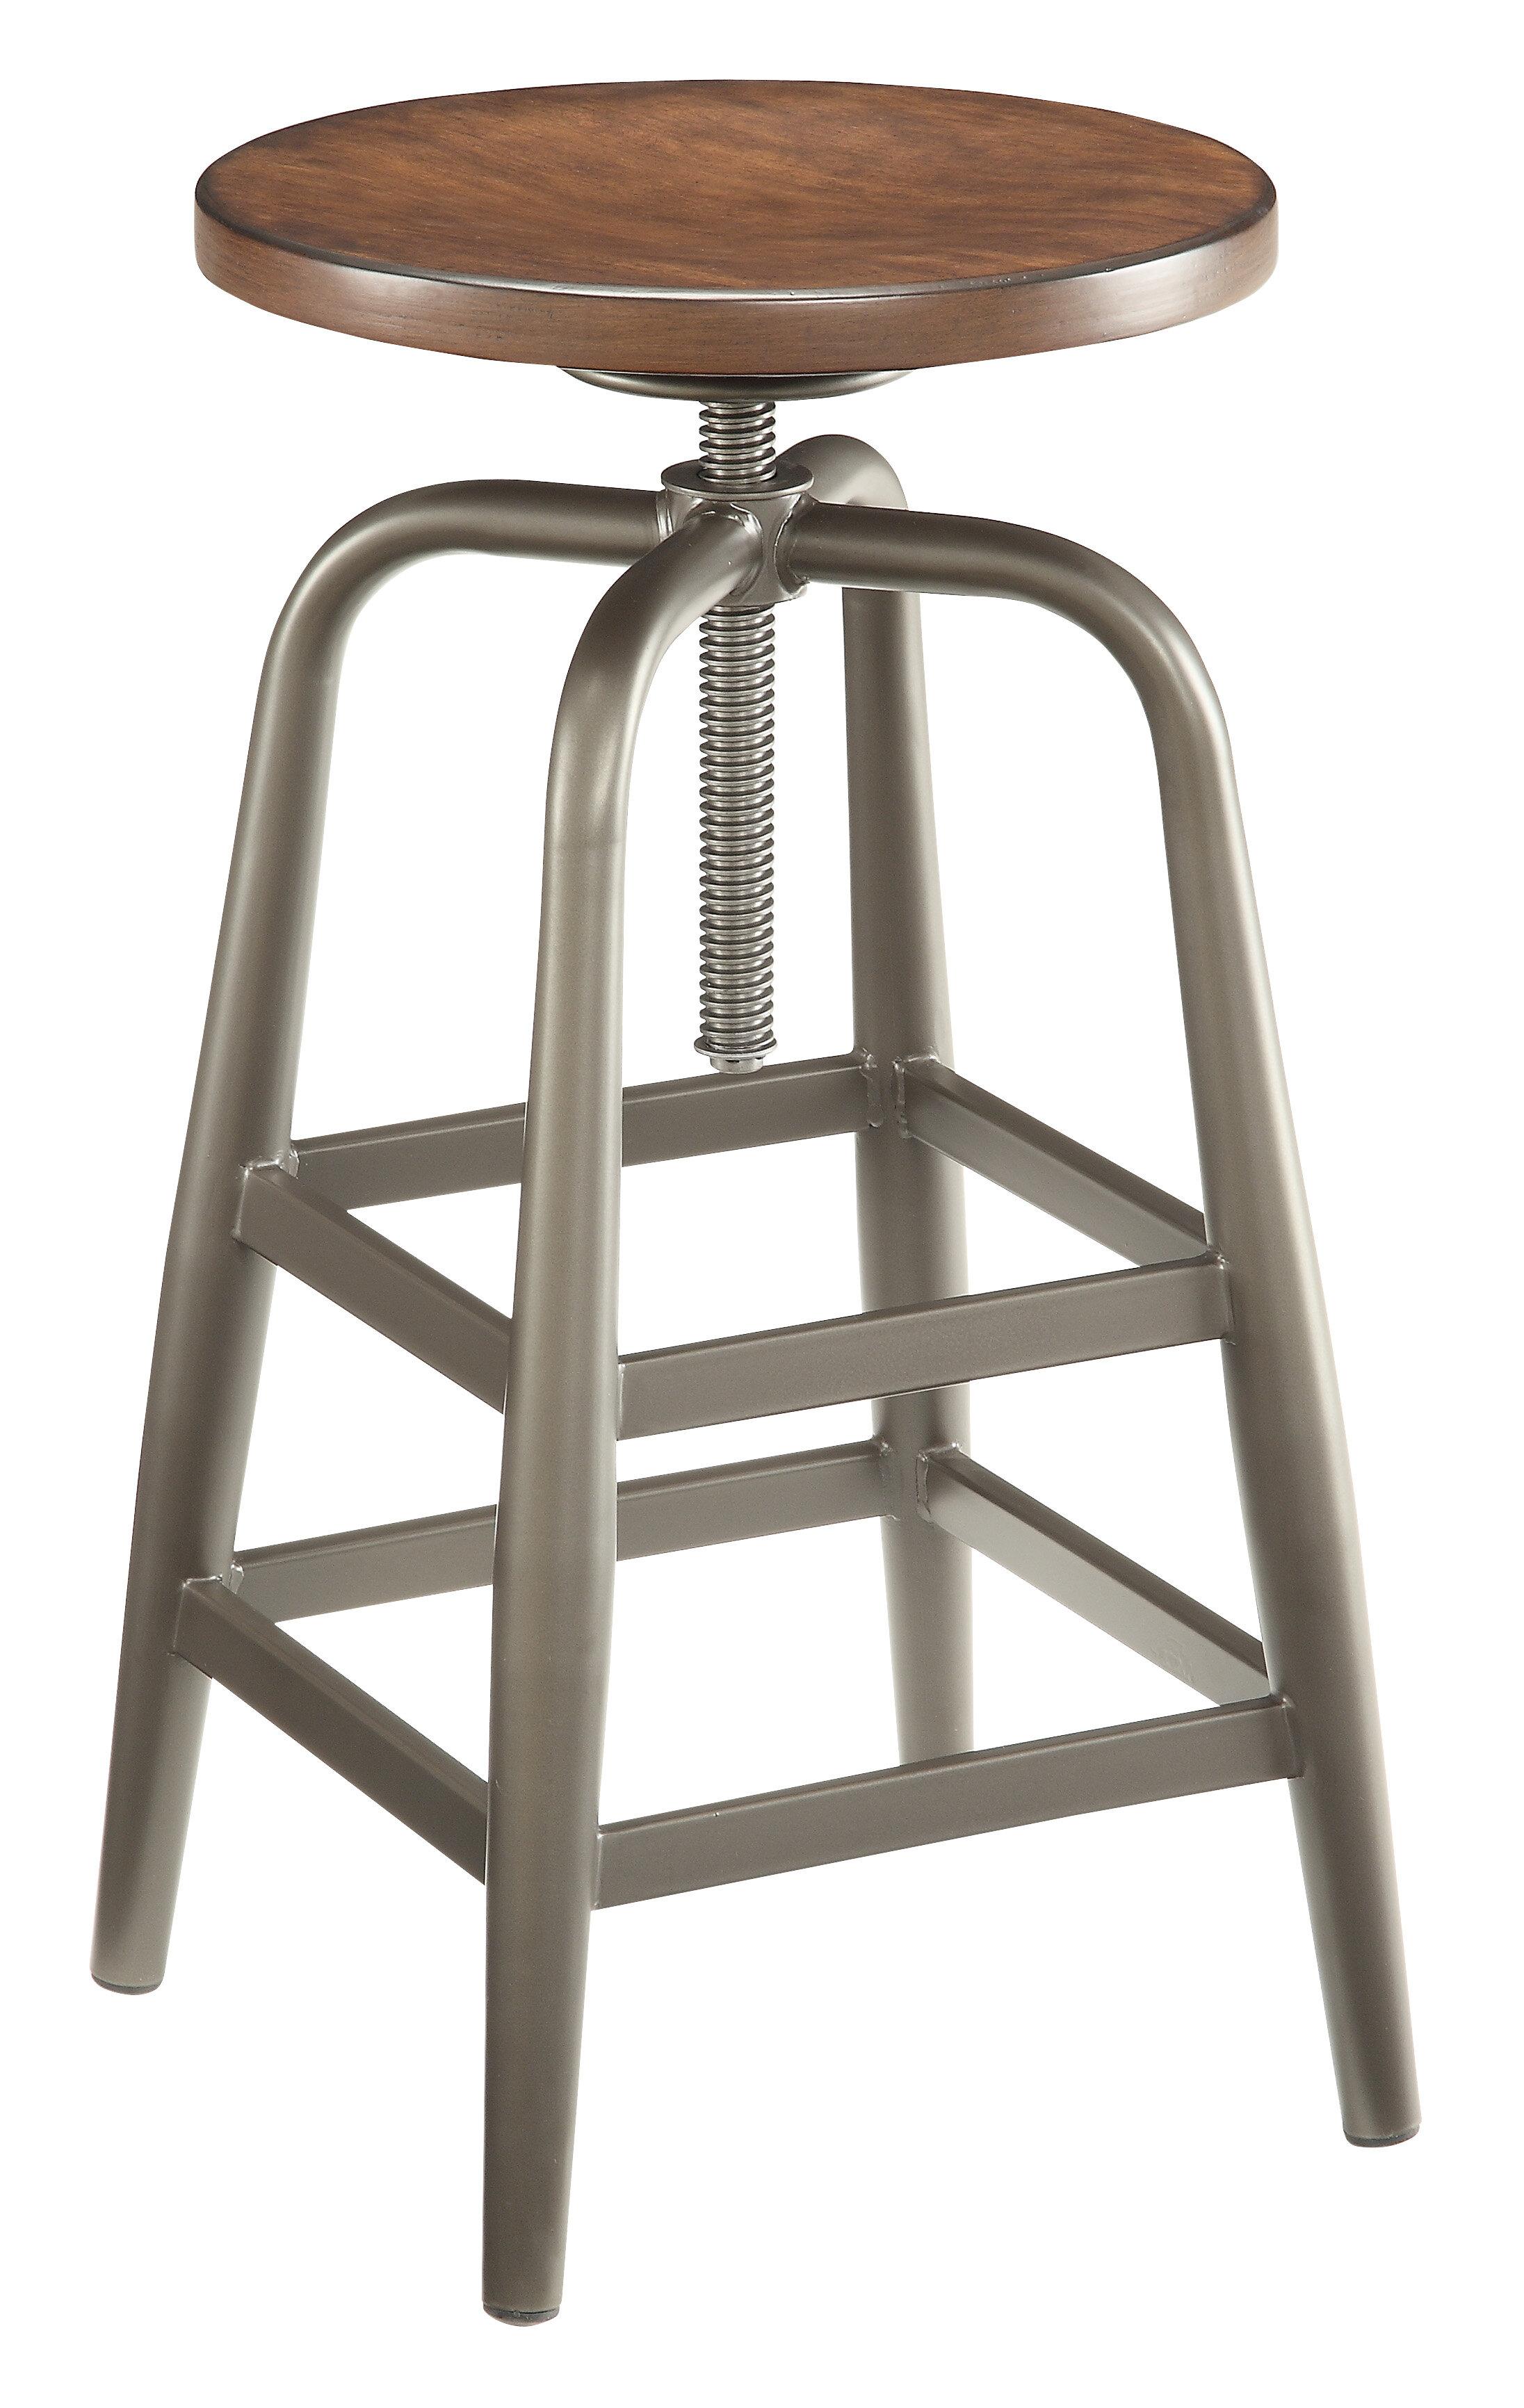 Wondrous Berger Adjustable Height Swivel Bar Stool Gamerscity Chair Design For Home Gamerscityorg